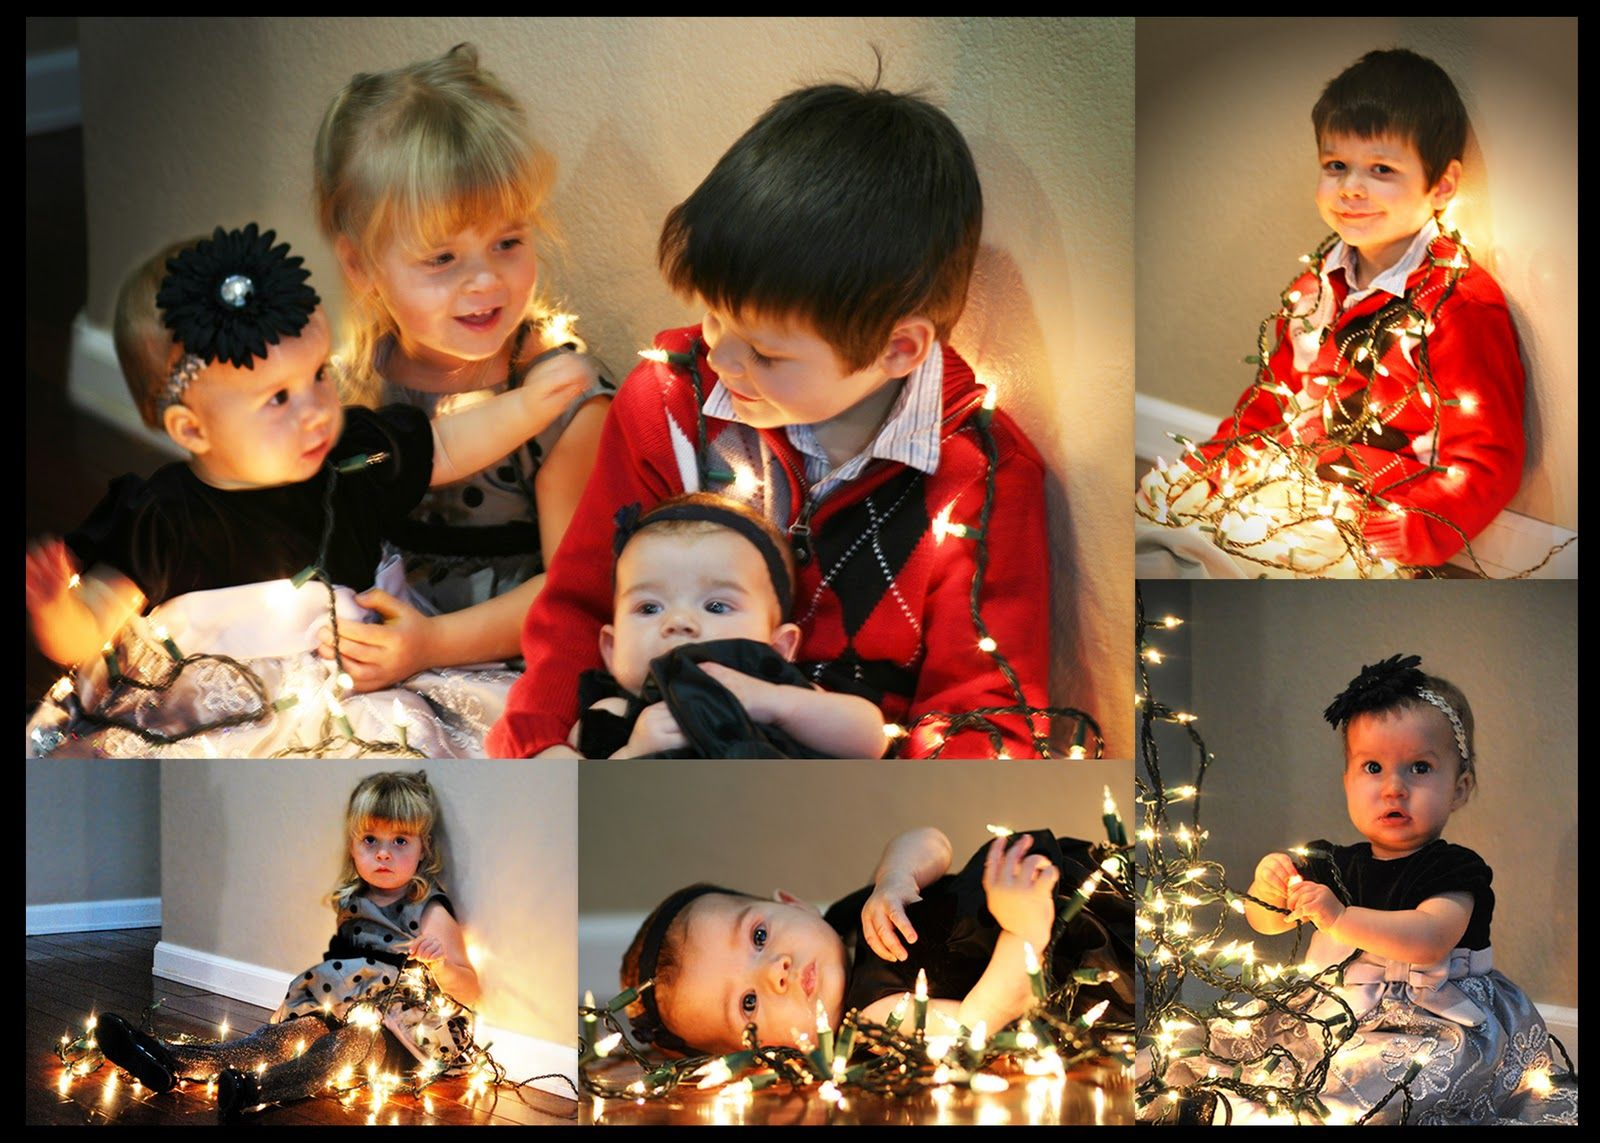 Knitting Butterflies: Christmas Lights Photo Shoot (Shoot and Edit Week 49 - Bokeh Lights)